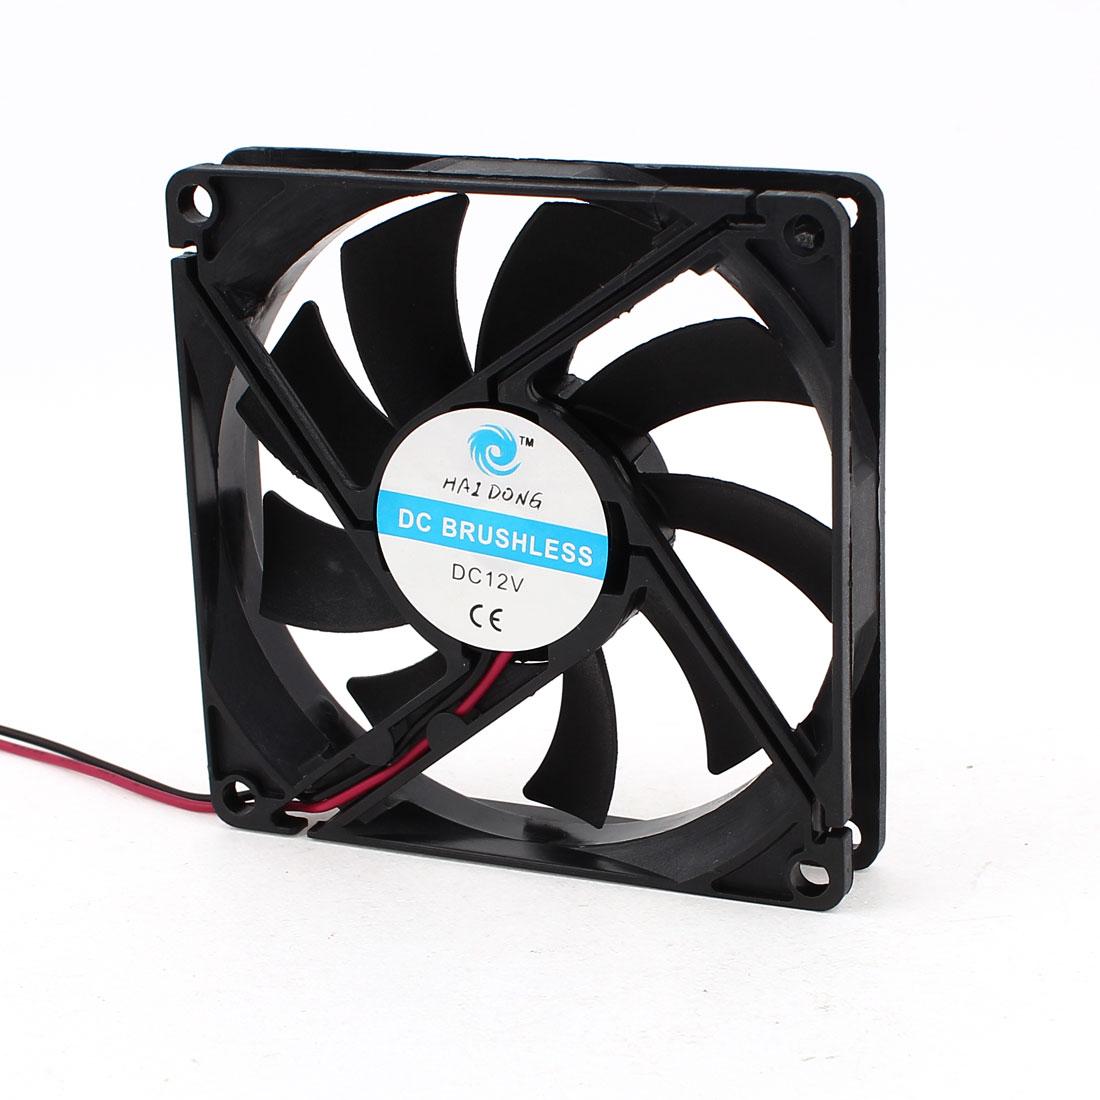 80mm x 15mm 8015 Brushless Cooling Fan DC 12V for Computer Case CPU Cooler